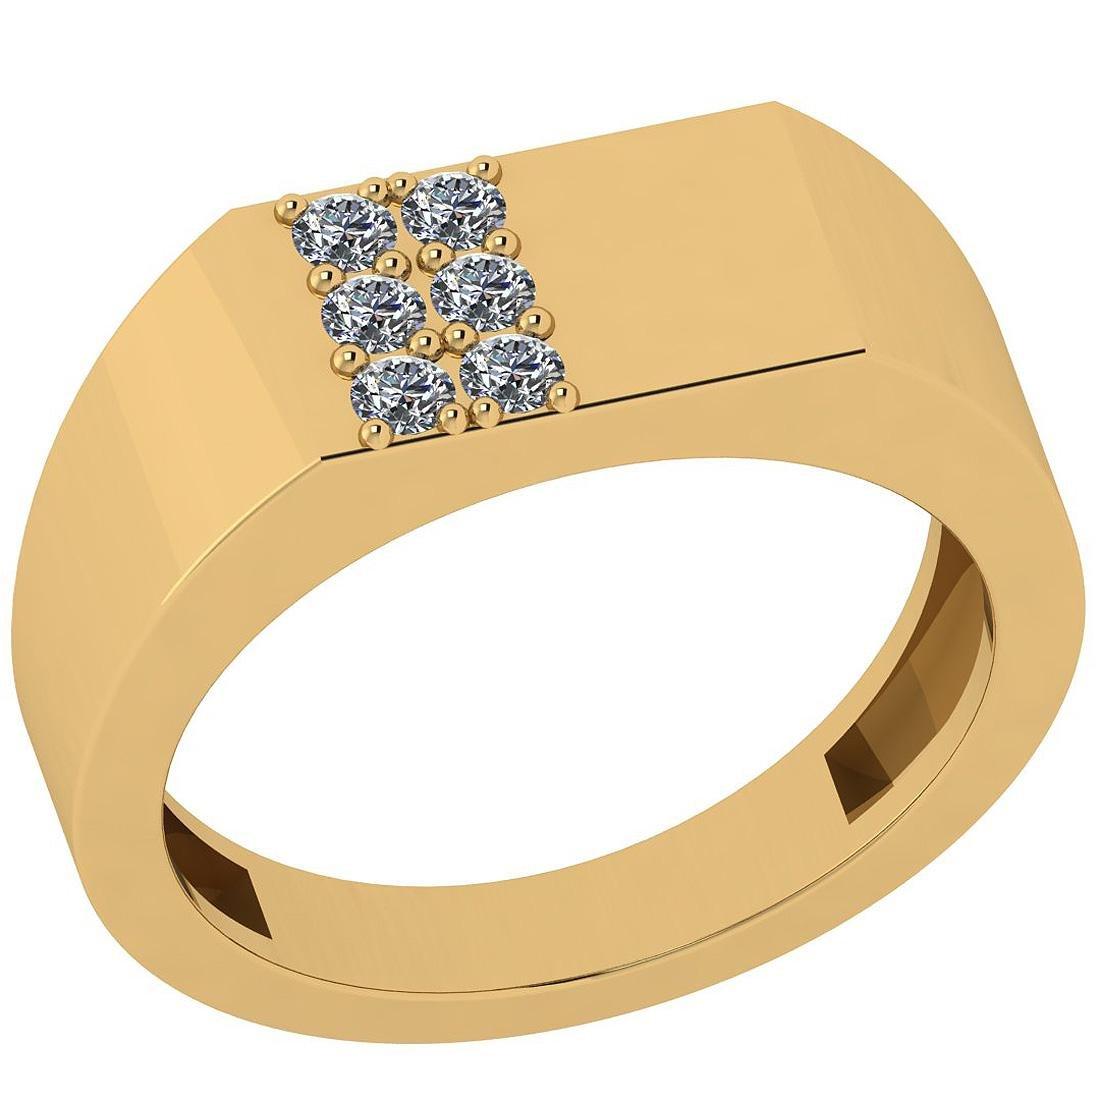 Certified 0.15 Ctw Diamond I1/I2 10k Yellow Gold Band R